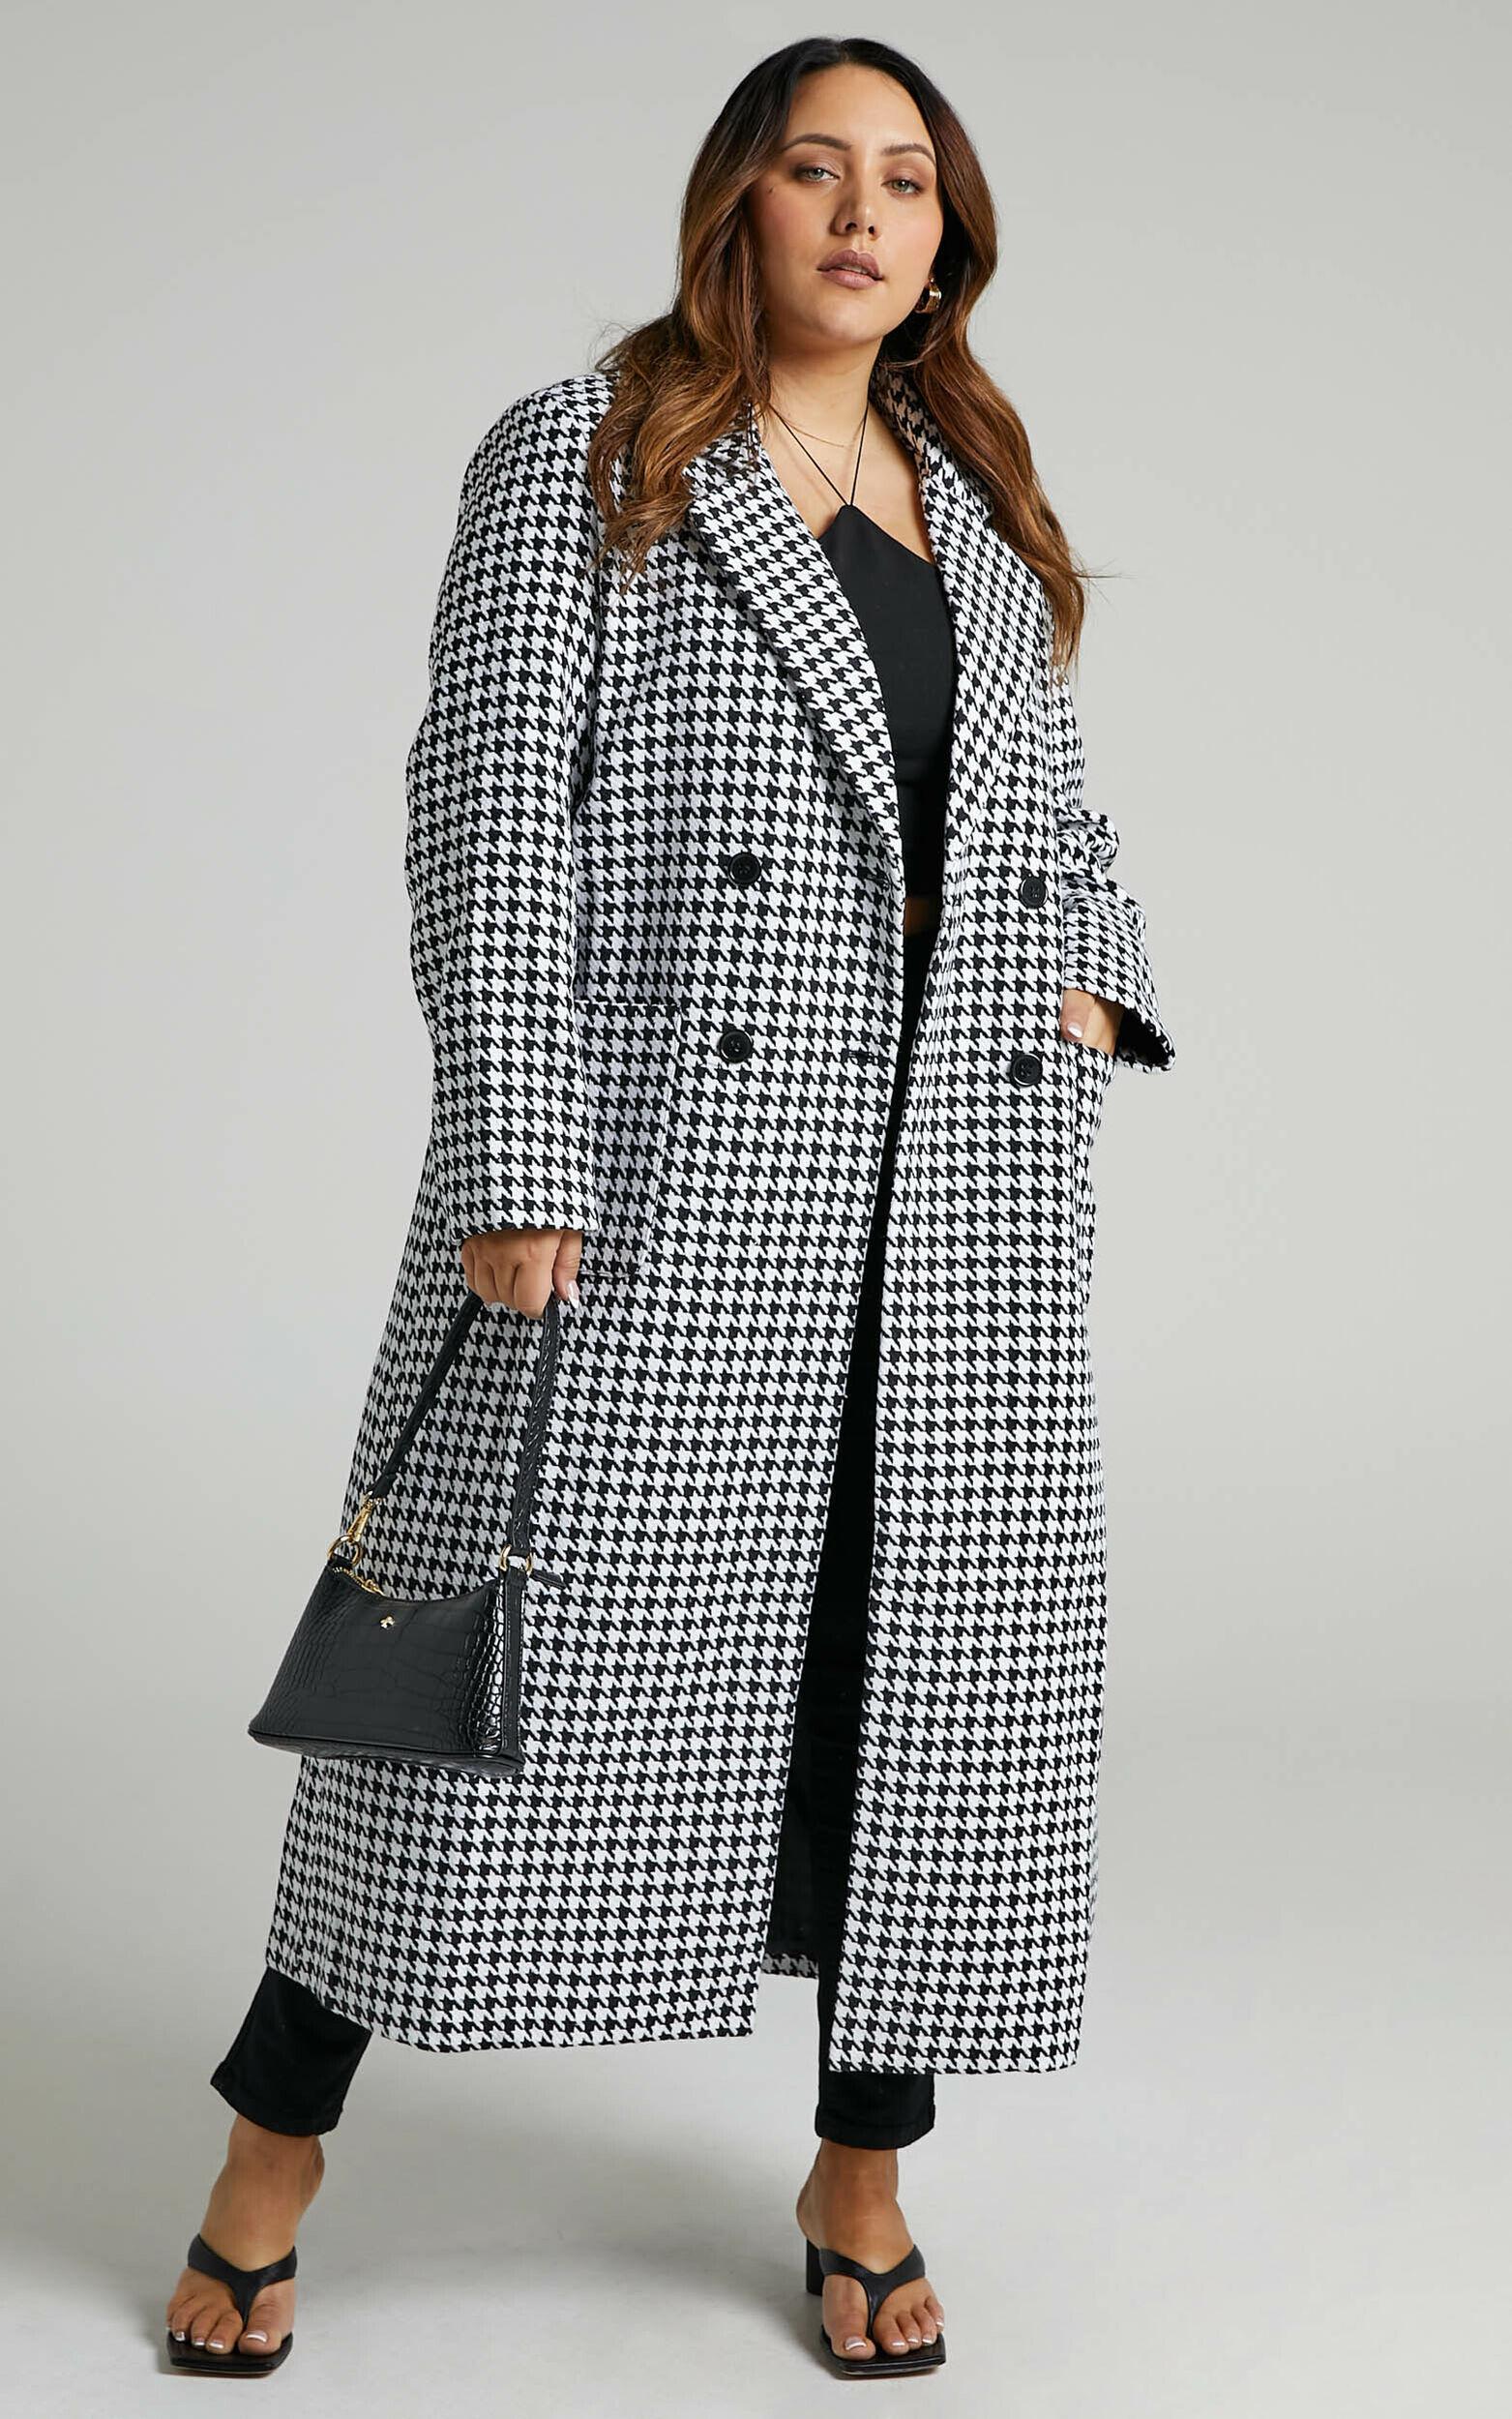 Violete Button Up Coat in Houndstooth Check - 20, BLK1, super-hi-res image number null